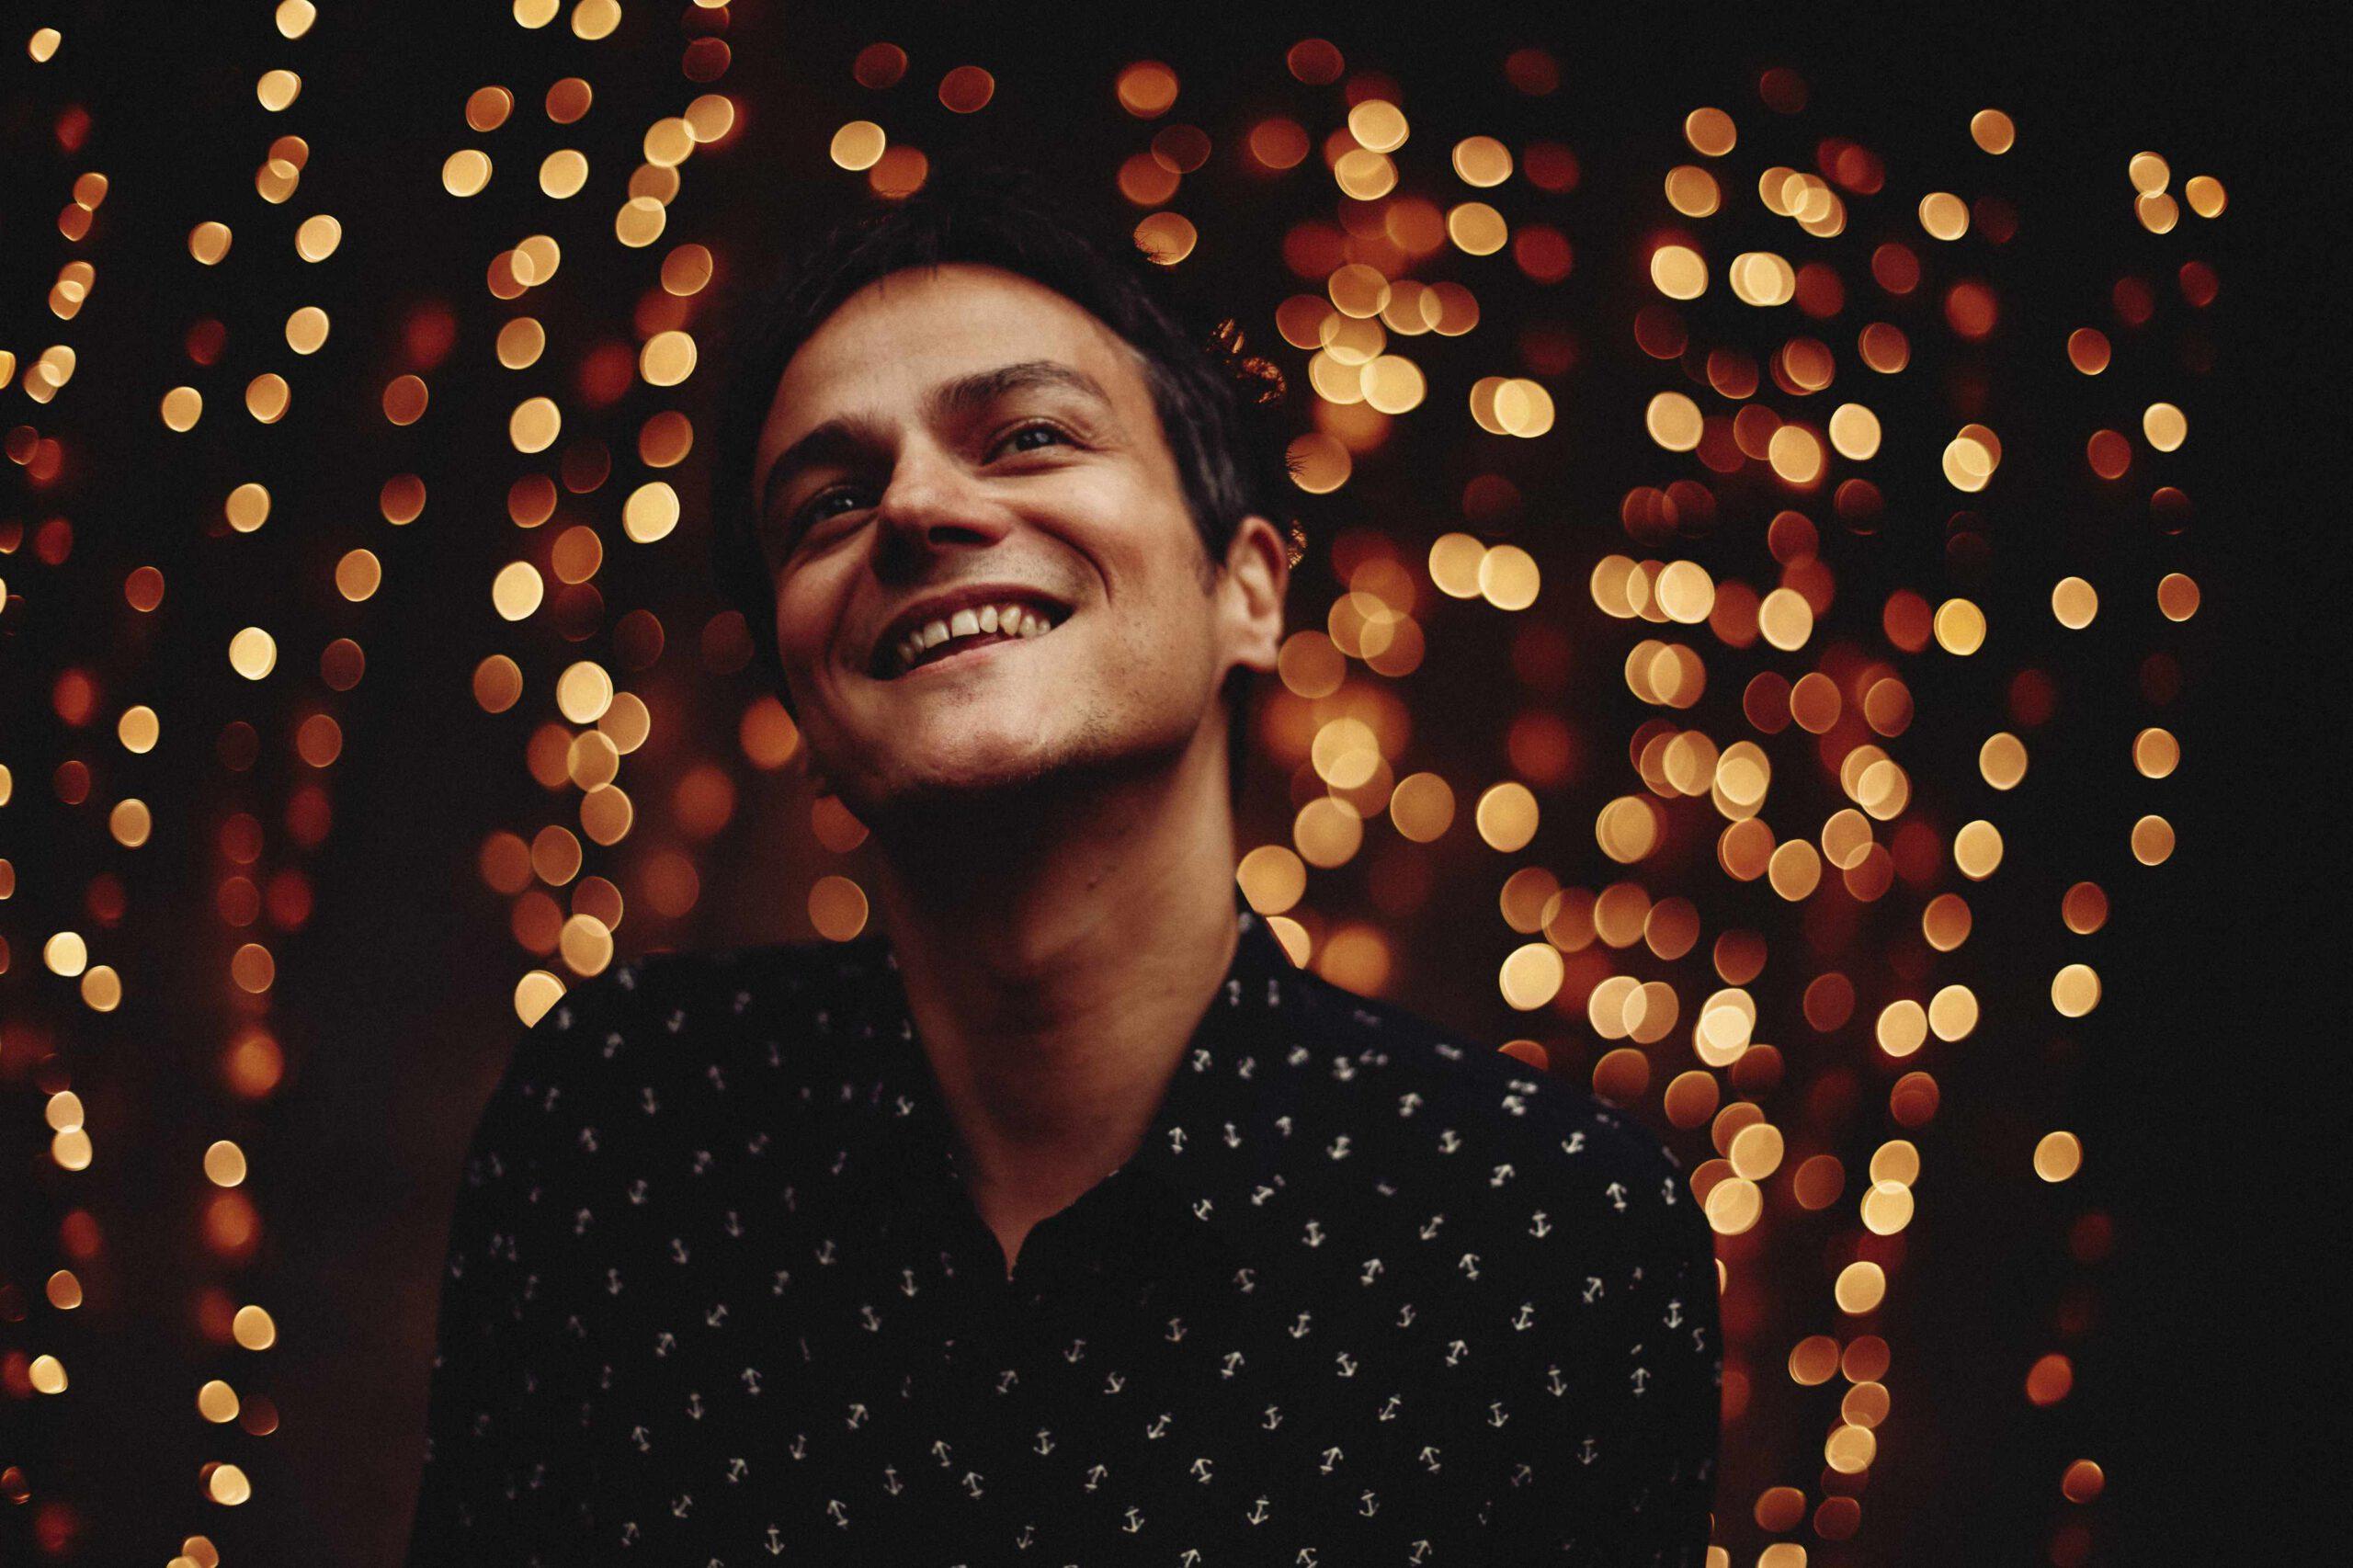 Jamie_Cullum_Christmas_Copright_universal